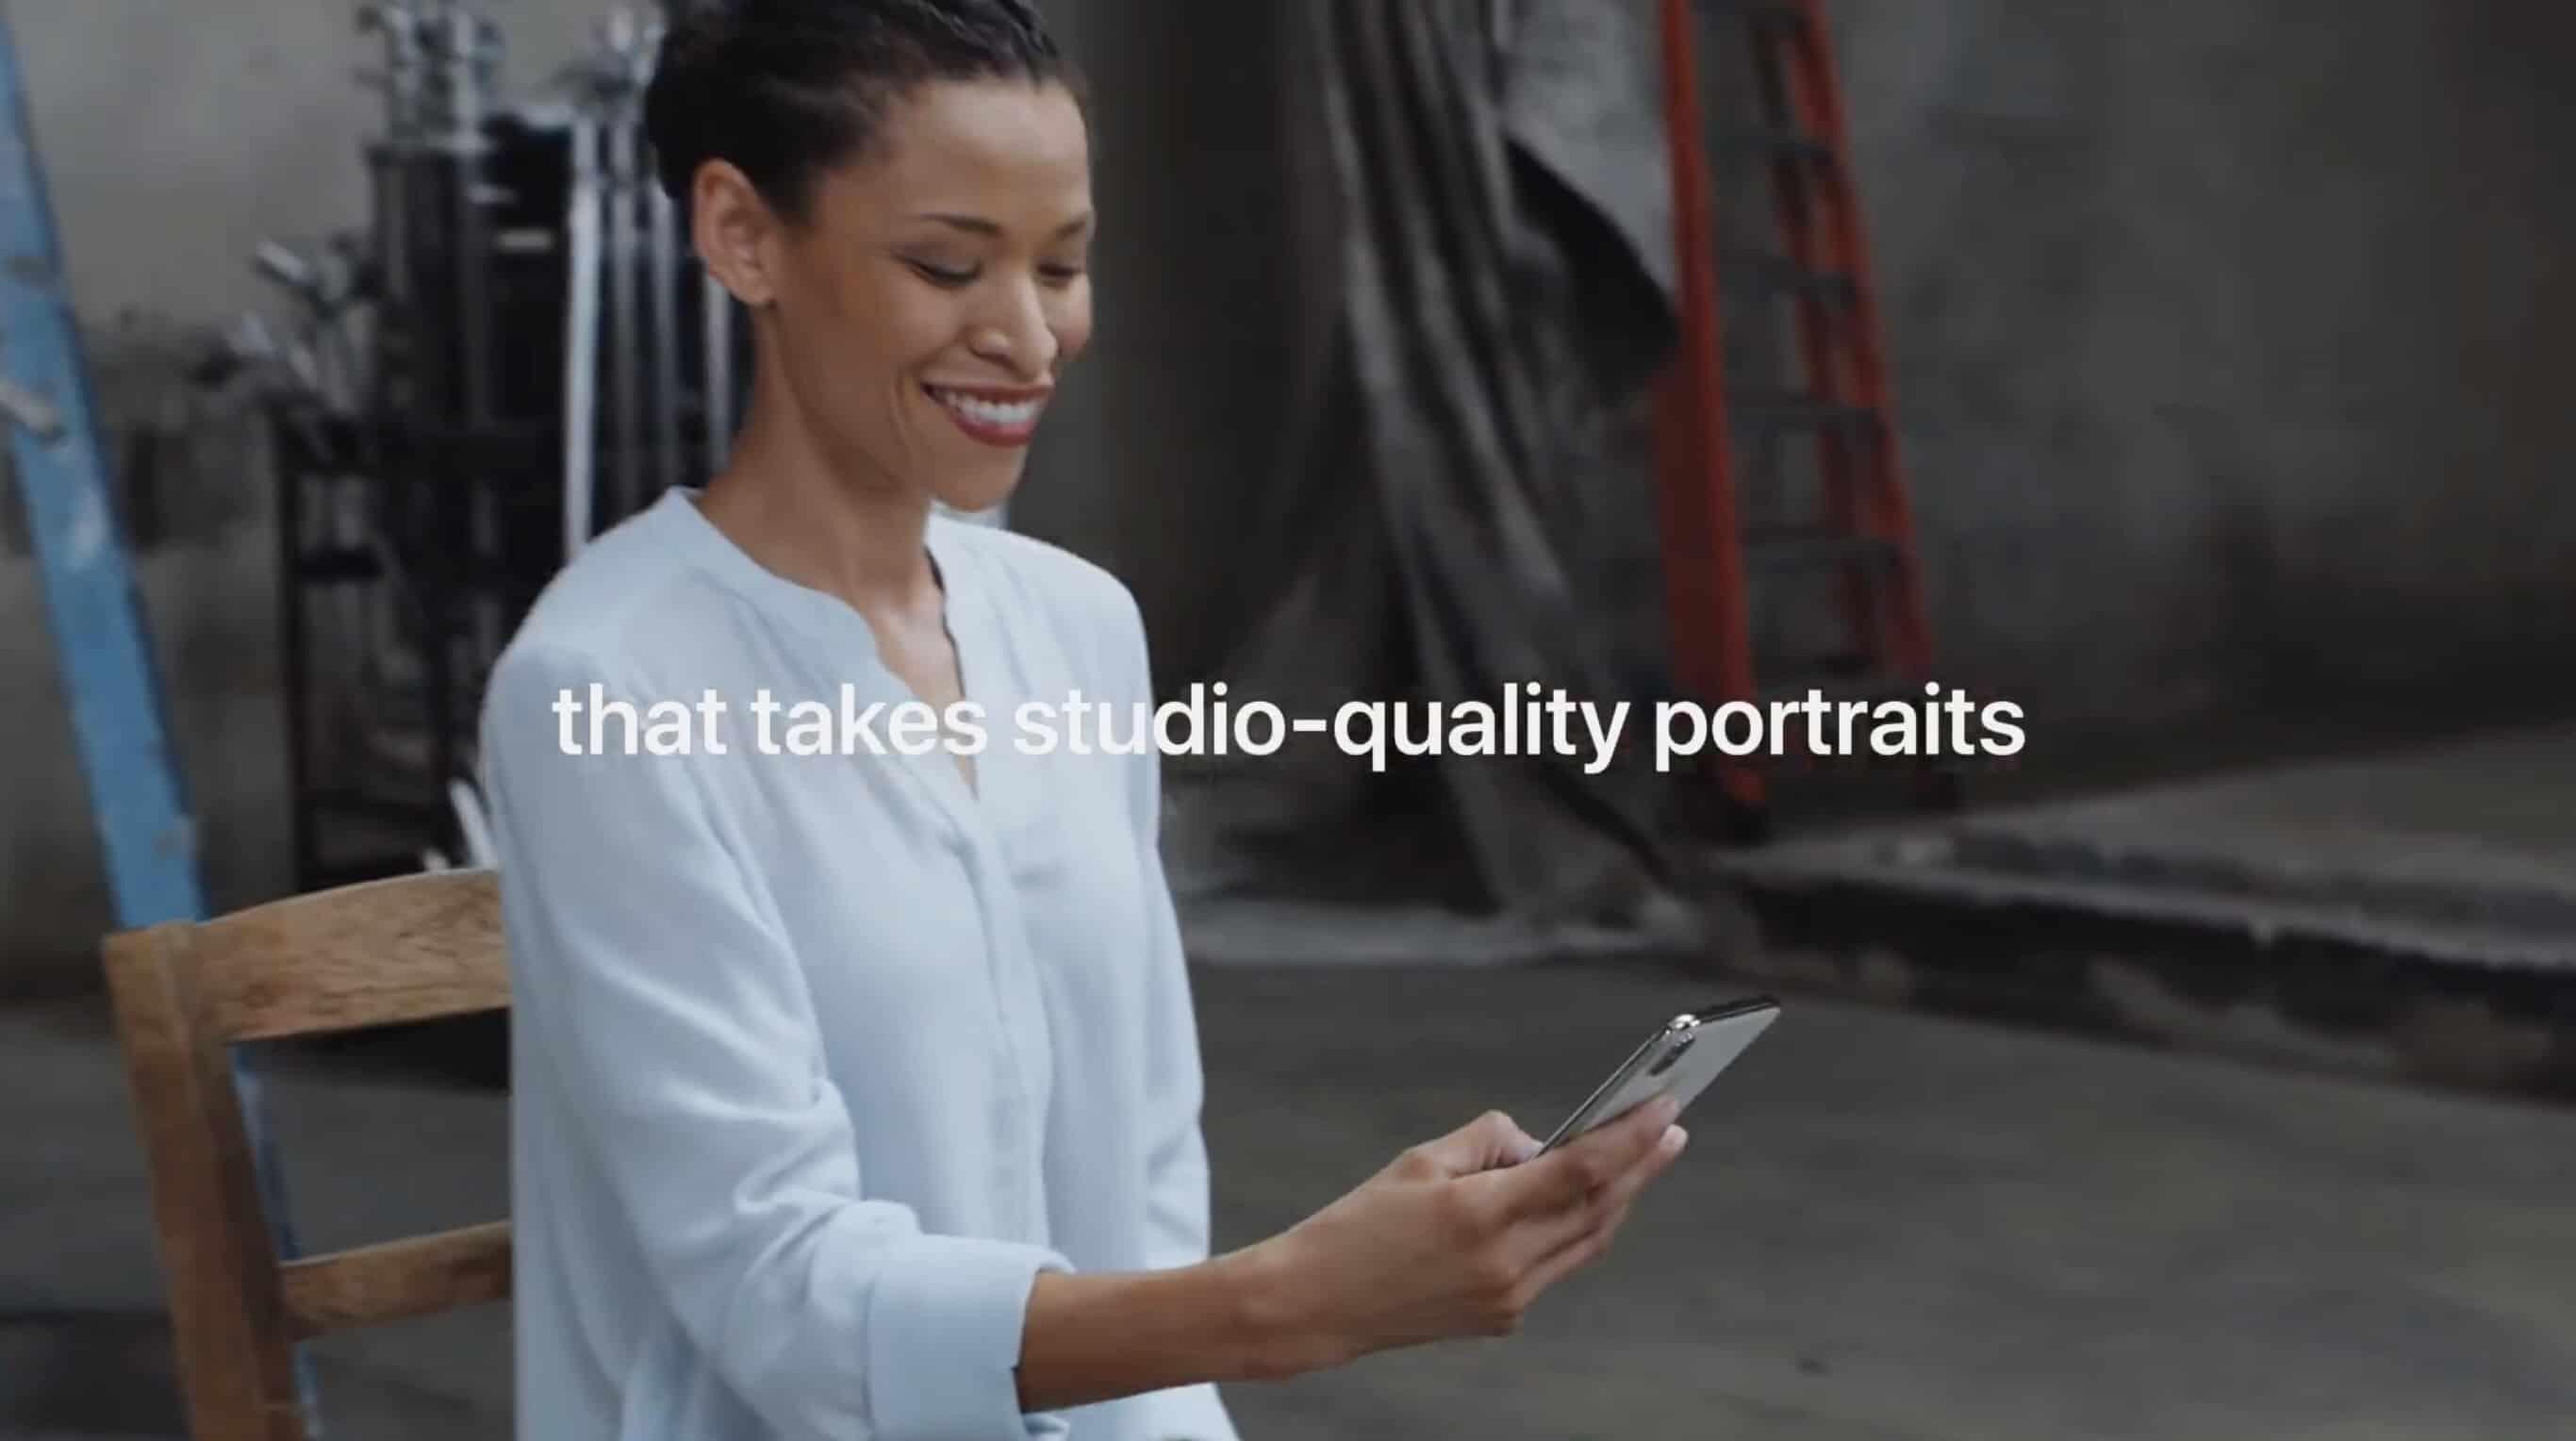 Apple ad says iPhone X takes studio-quality portraits.